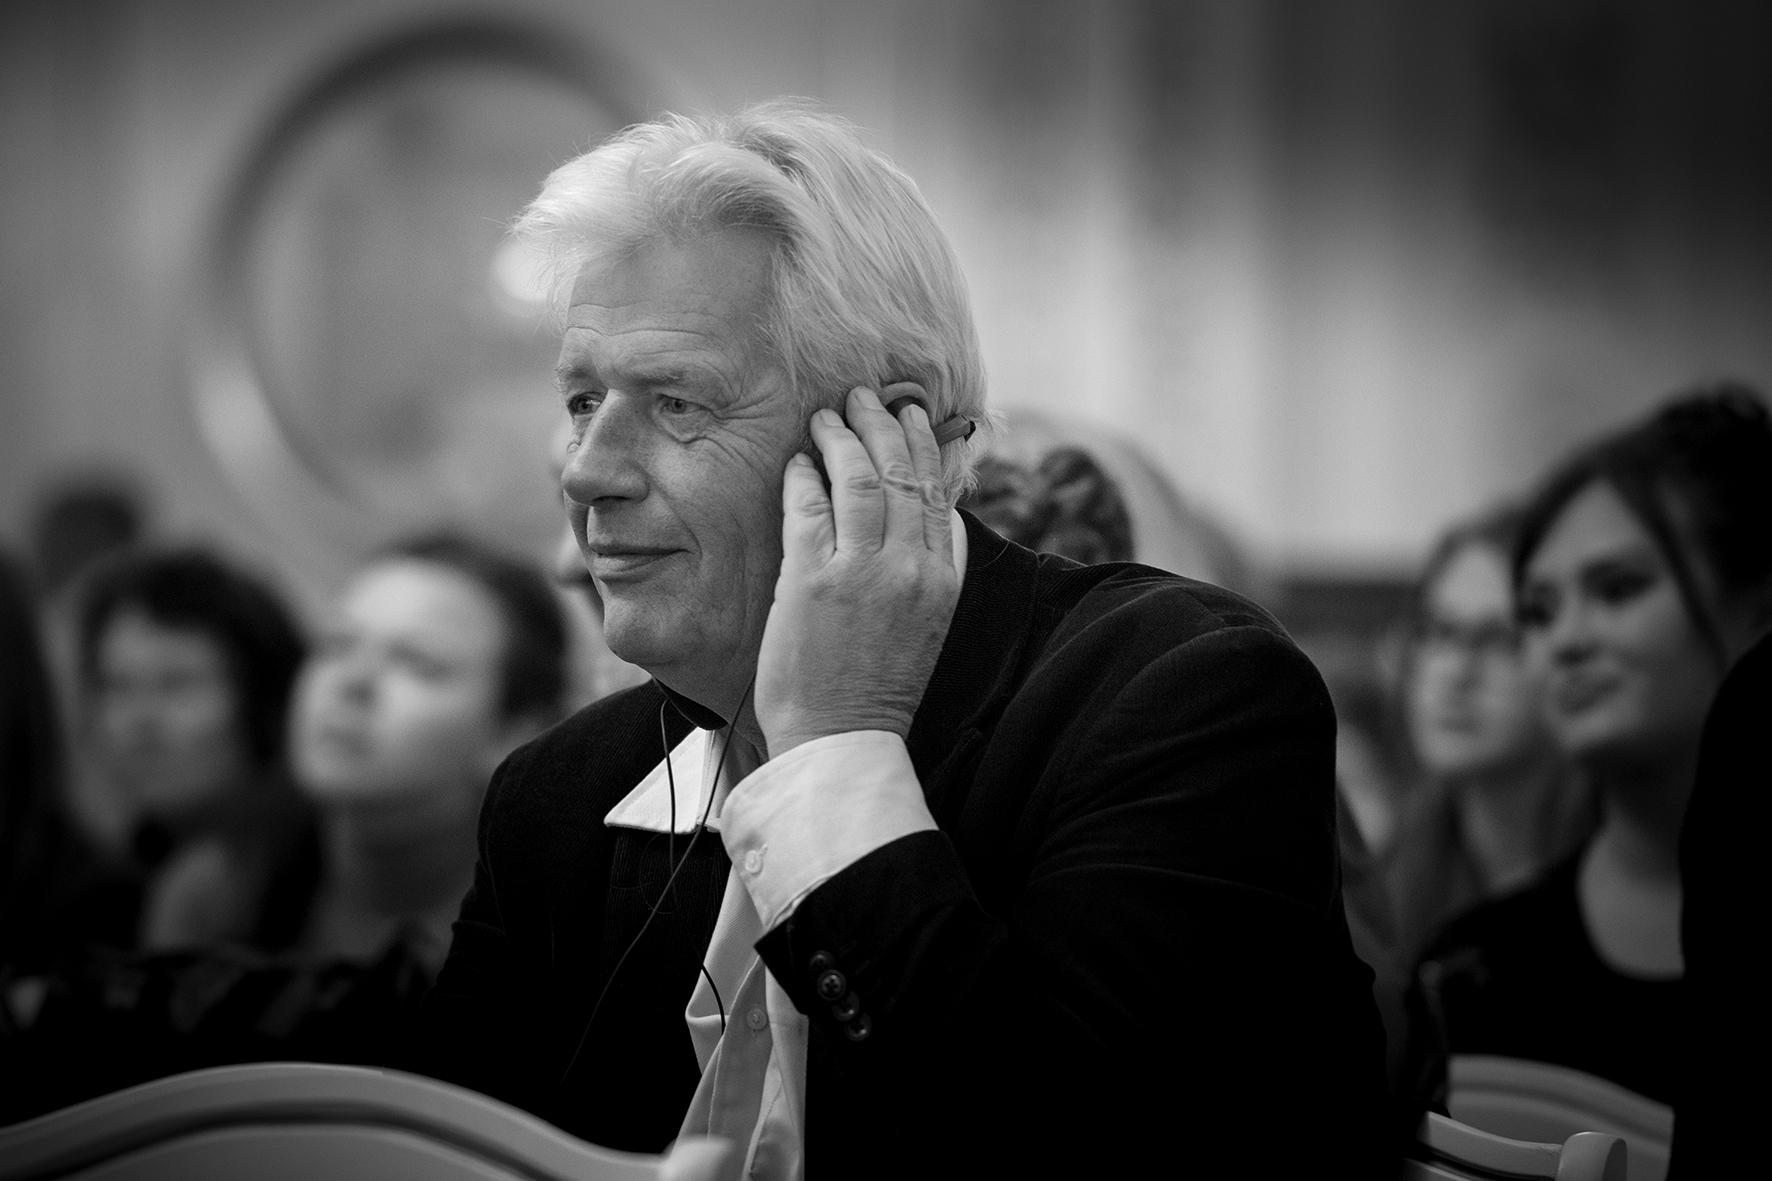 Sjoerd Kuyper © Hartwig Klappert